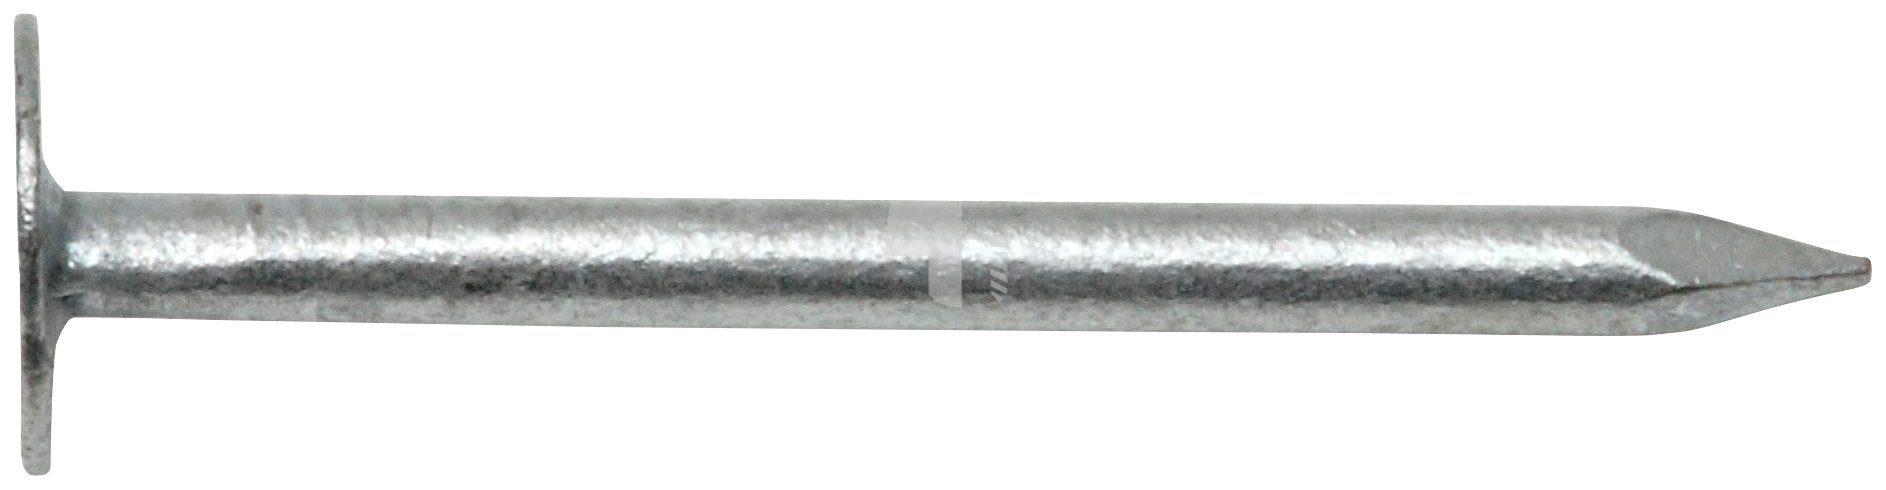 RAMSES Nagel , Dachpappstifte DIN 1160 2,5 x 35 mm Stahl feuerverzinkt